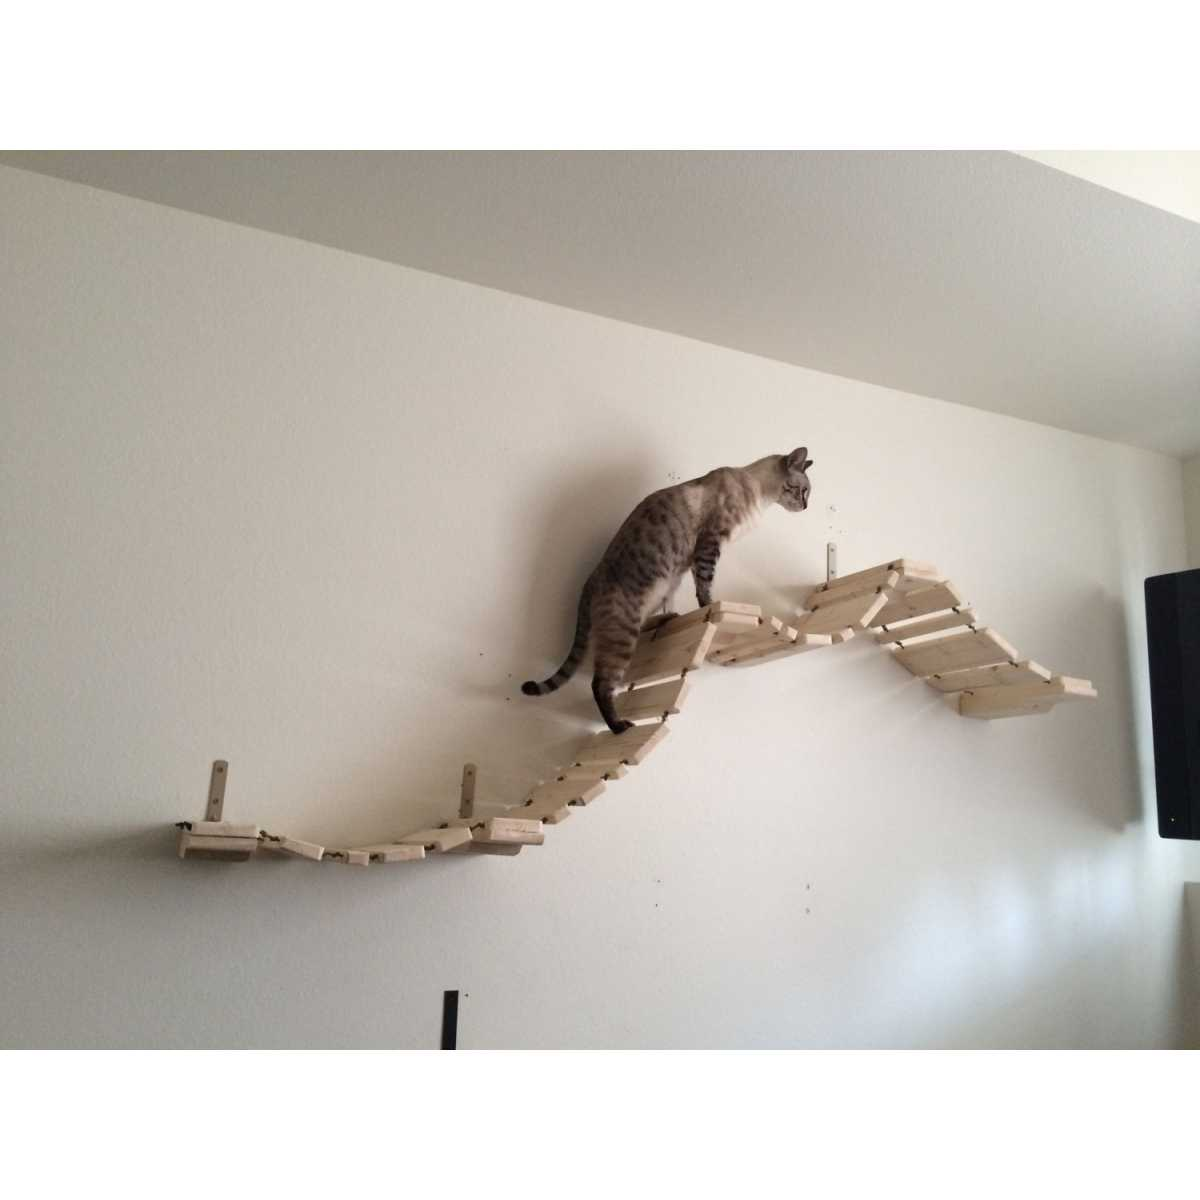 catastrophicreations deluxe cat wall mounted boardwalk bridge. Black Bedroom Furniture Sets. Home Design Ideas